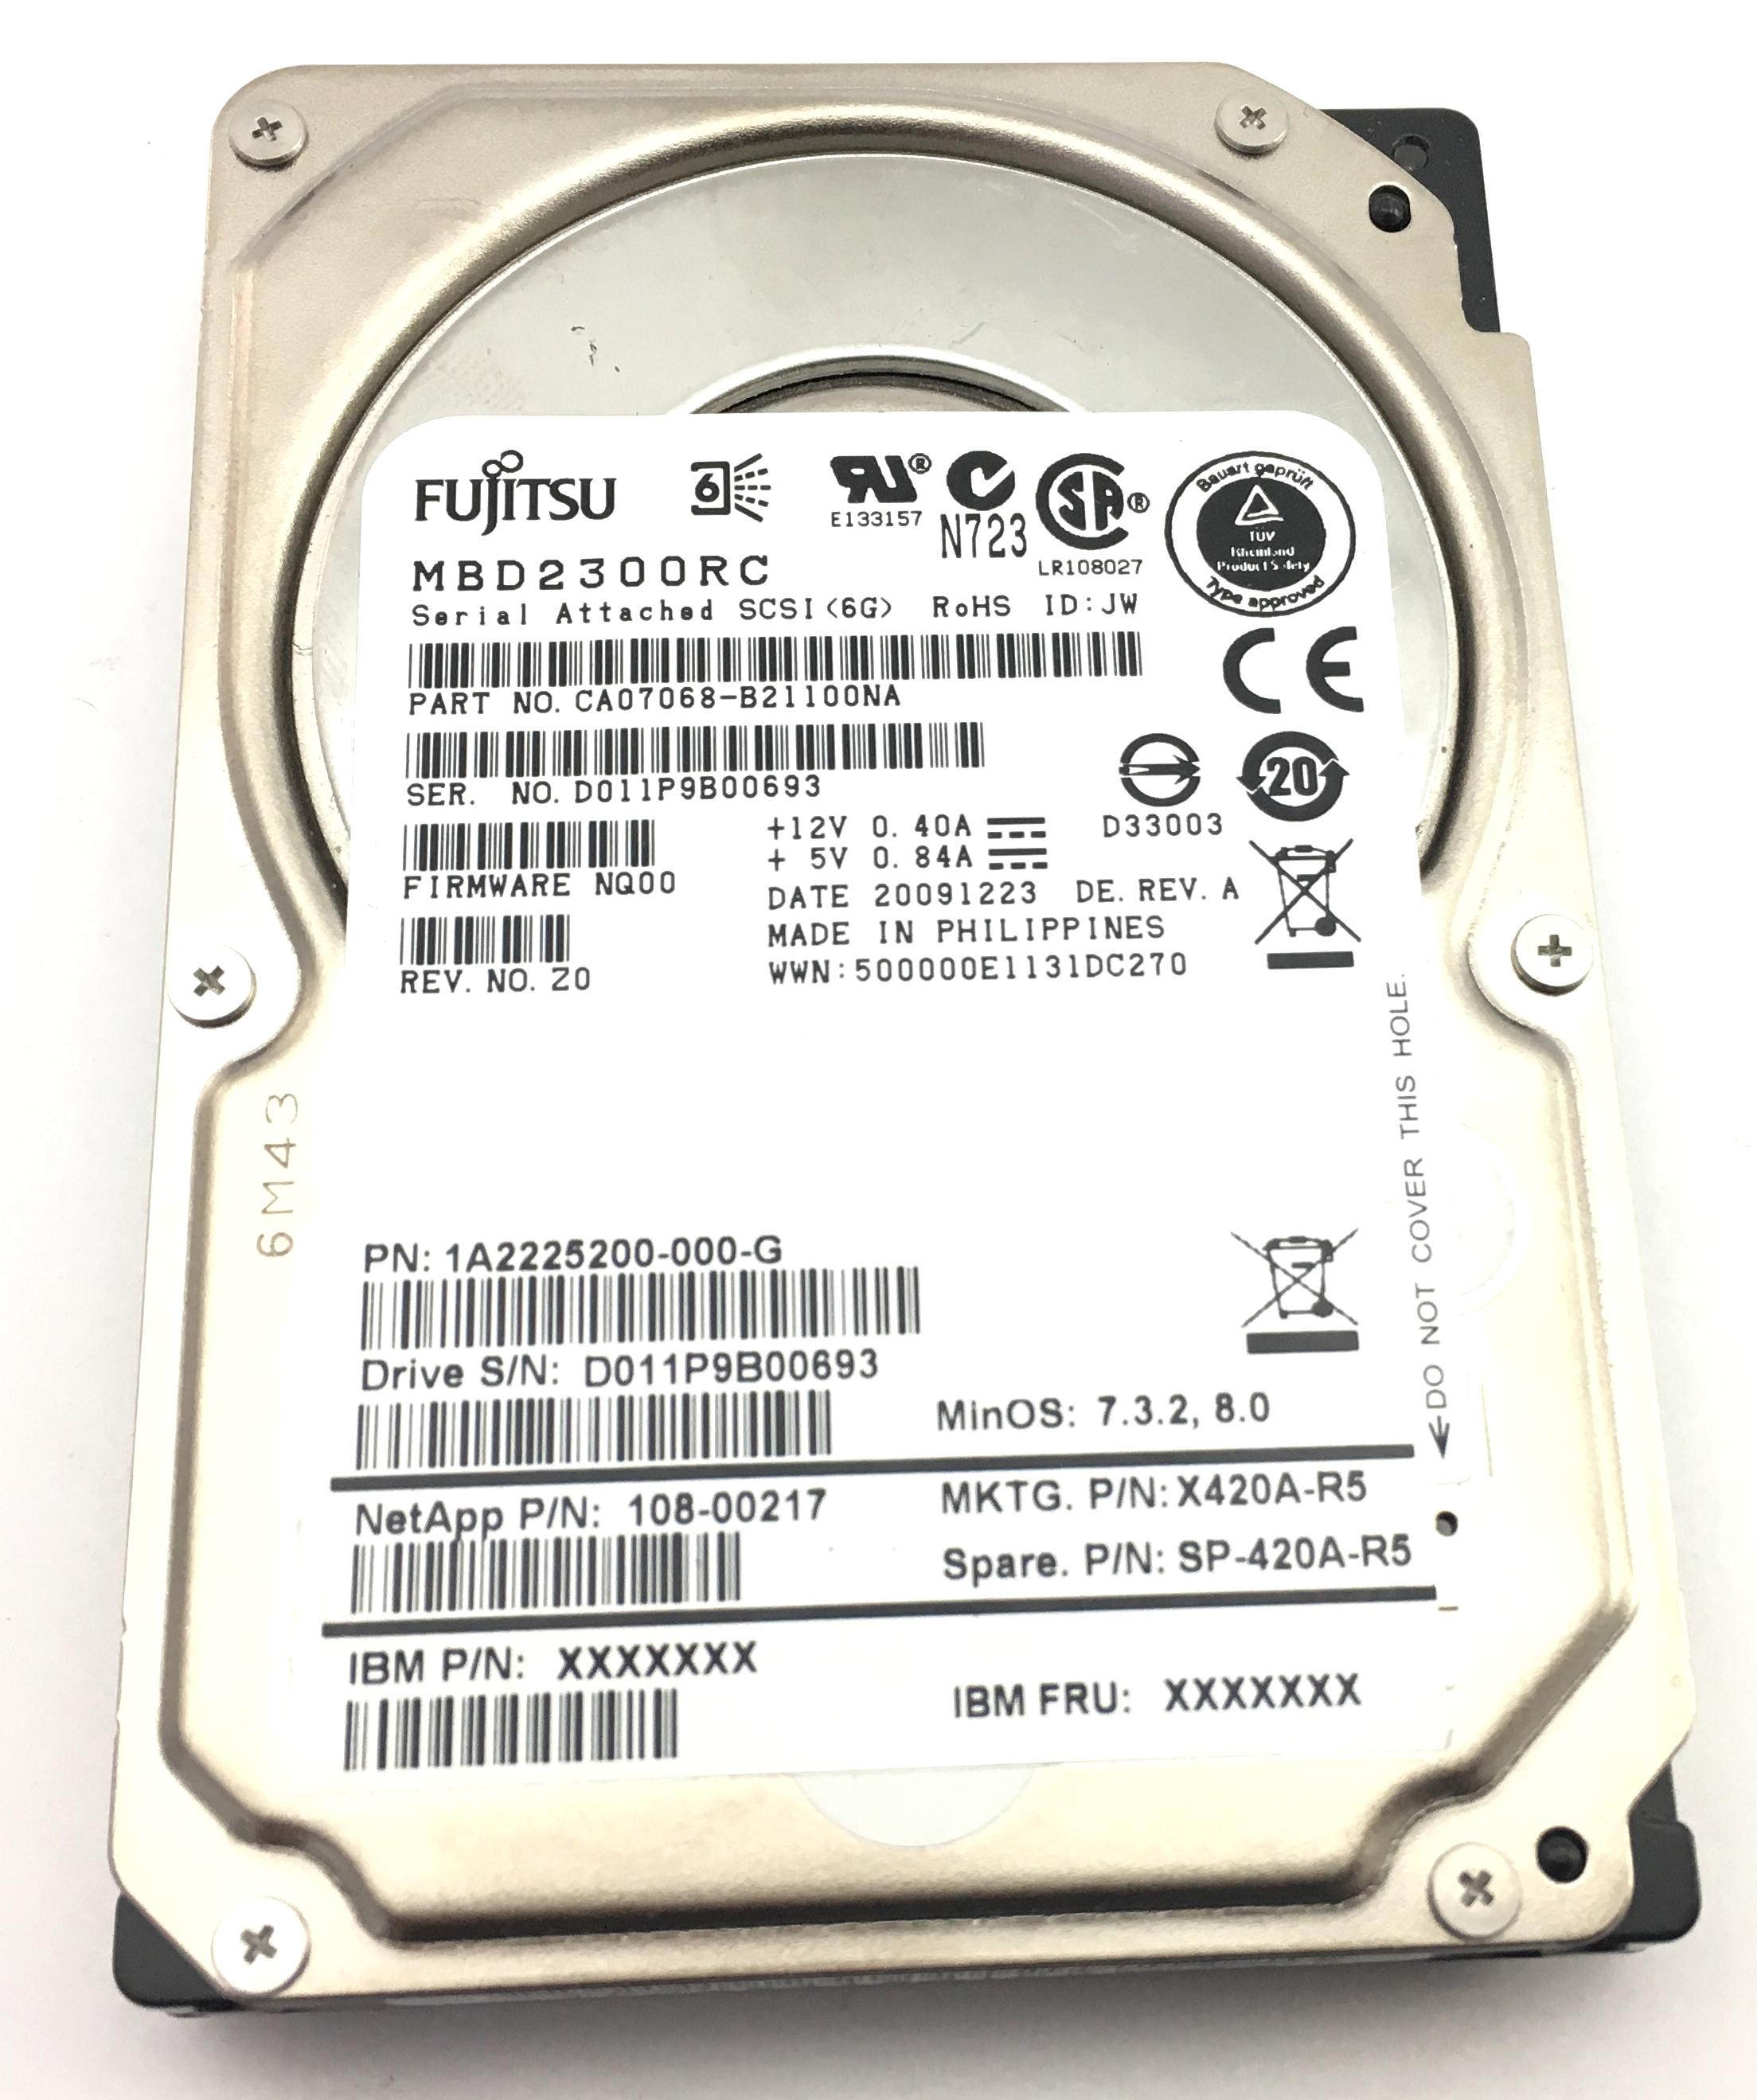 Netapp Fujitsu 300GB 10K 6Gbps SAS 2.5'' Hard Drive (SP-420A-R5)